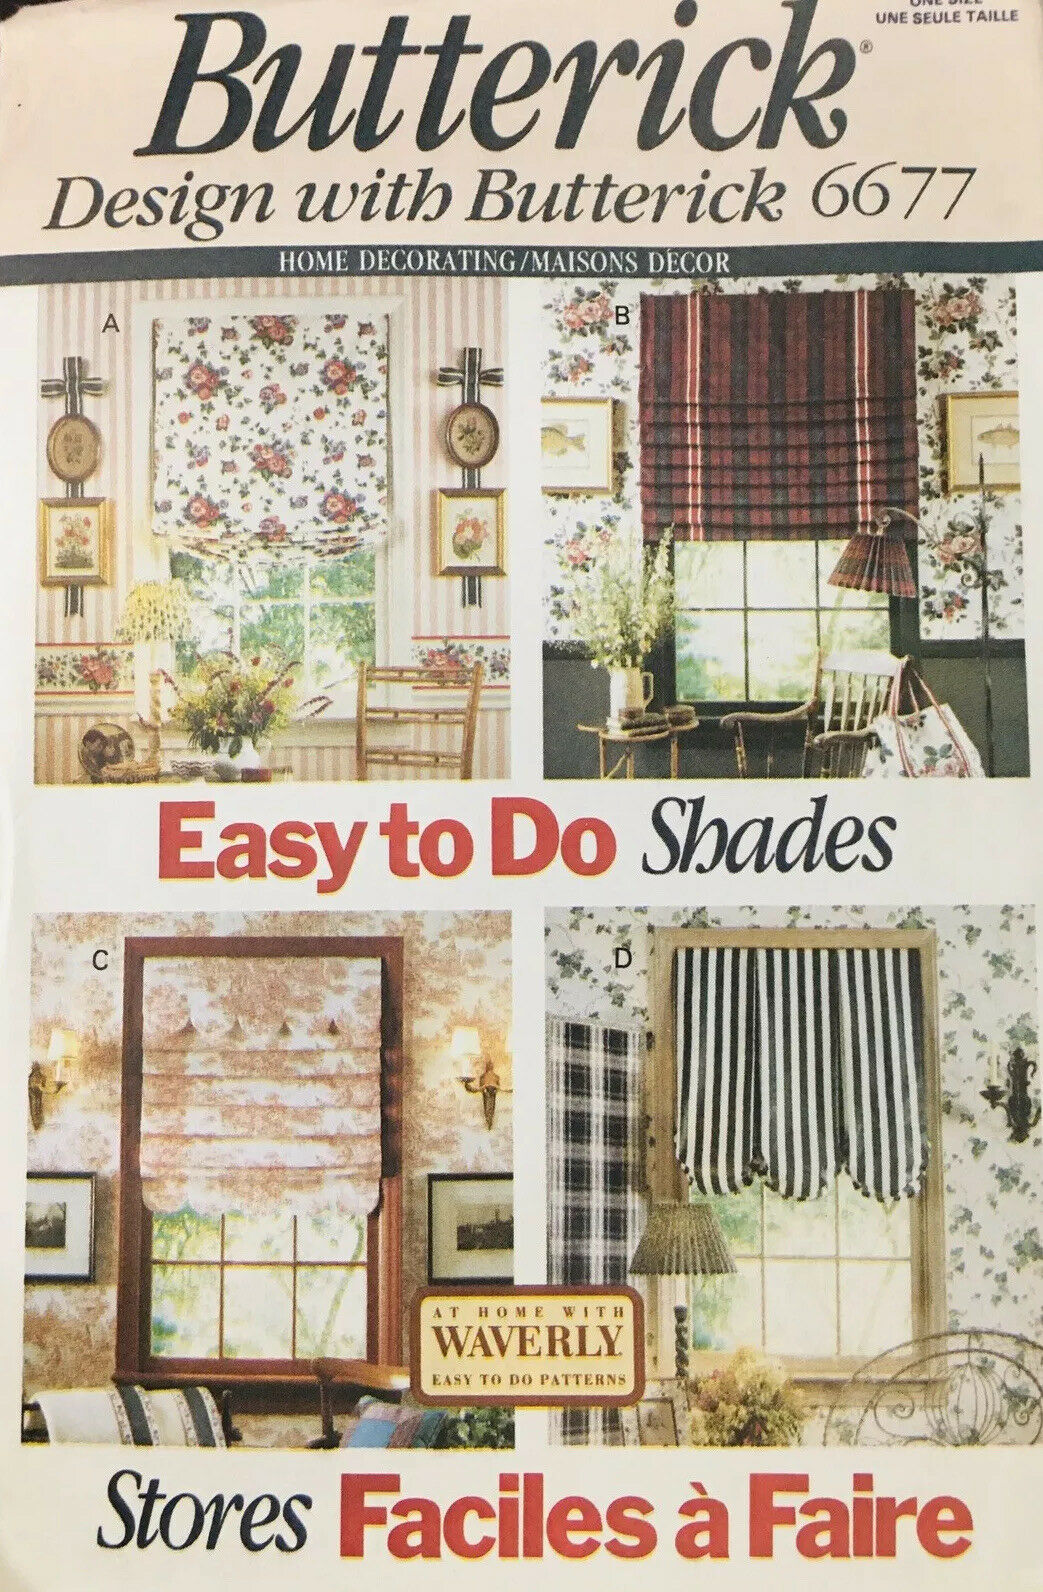 Butterick 3117 Uncut Sewing Pattern 2001 Home D\u00e9cor Waverly Window Treatments